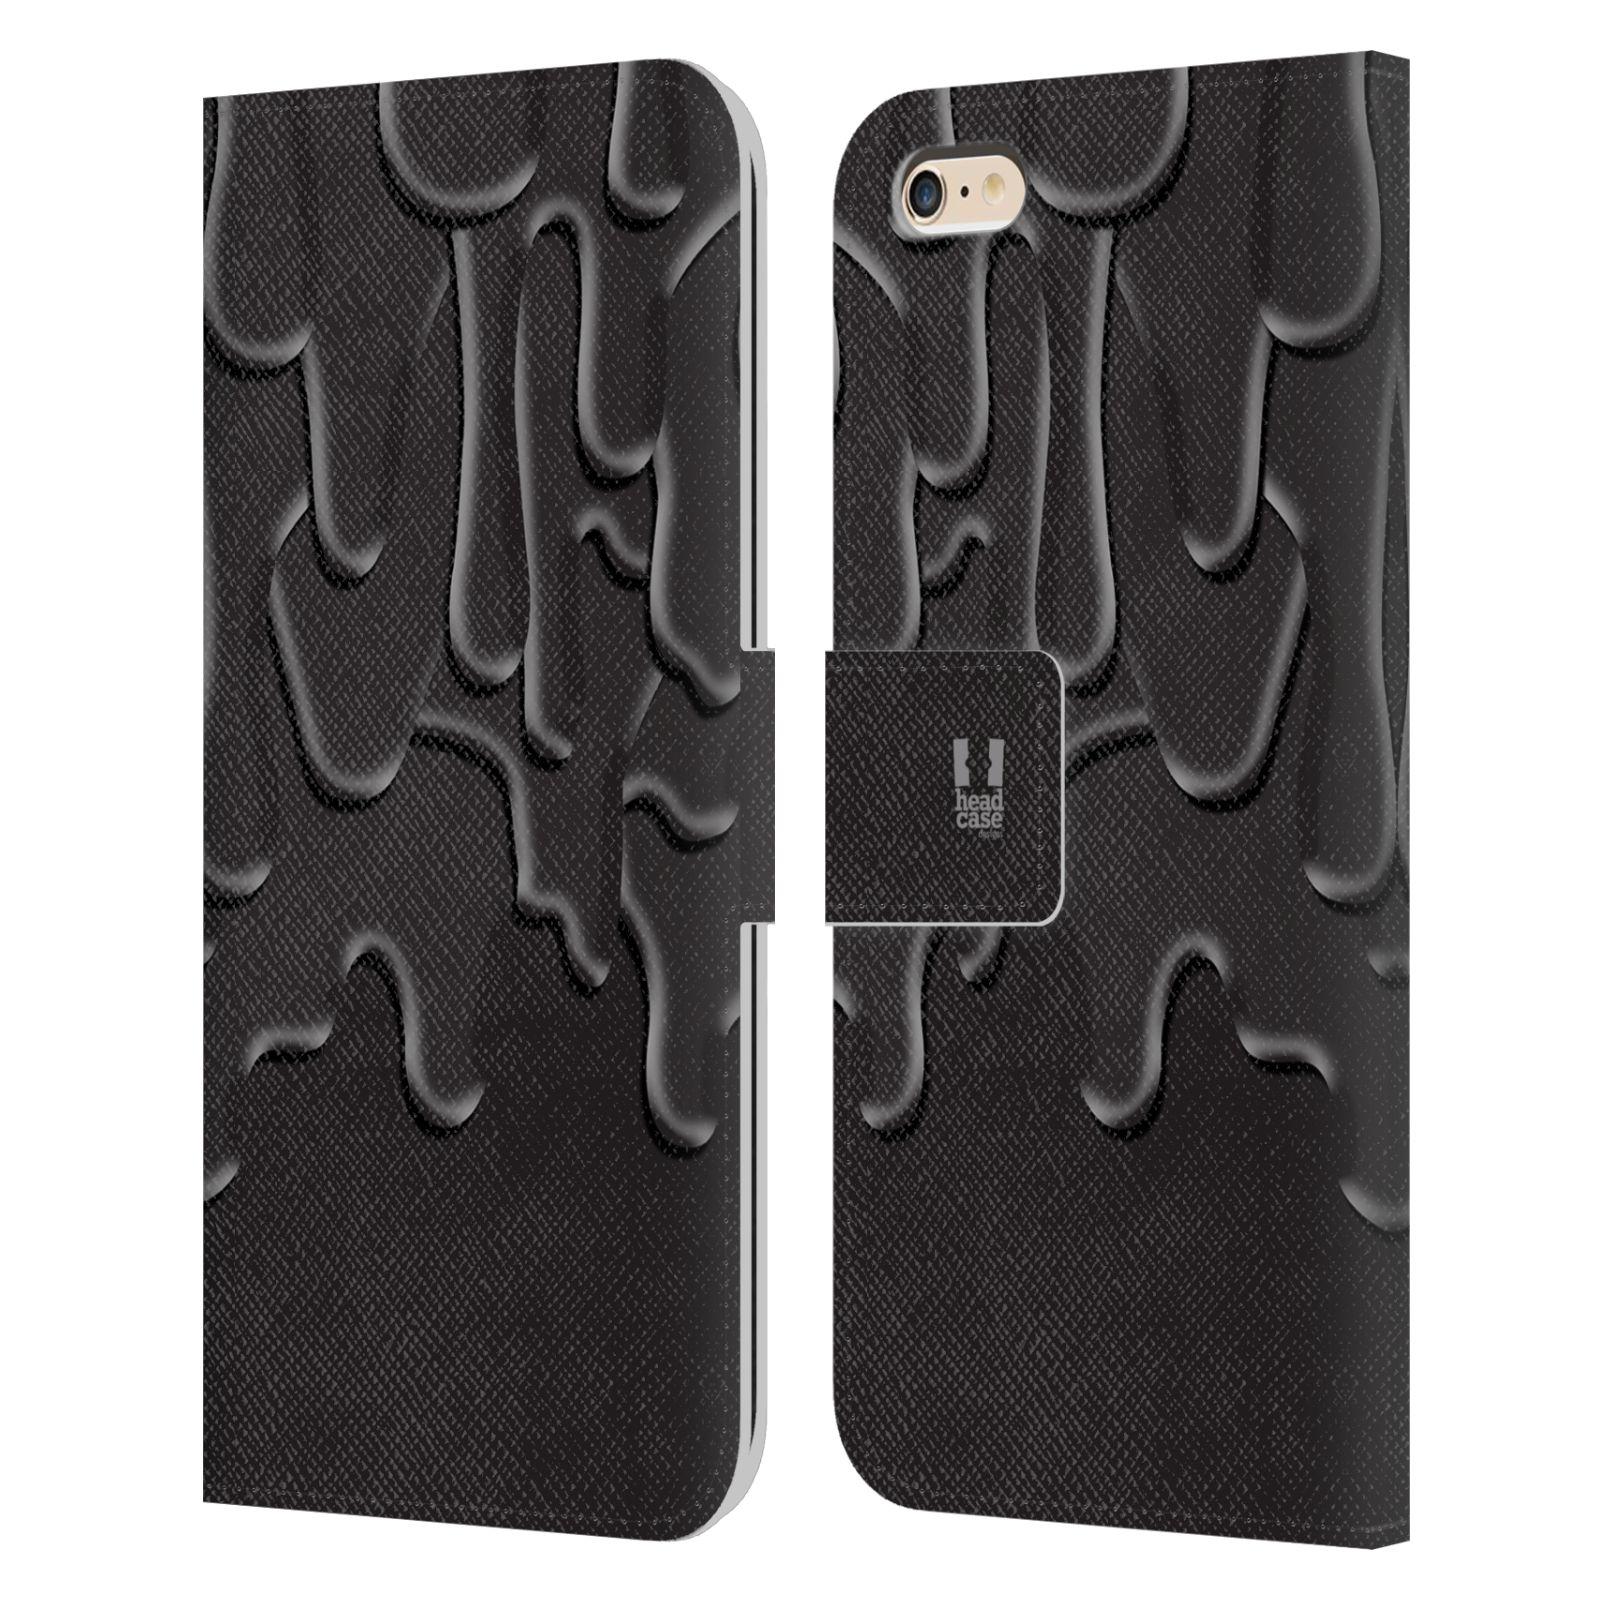 HEAD CASE Flipové pouzdro pro mobil Apple Iphone 6 PLUS / 6S PLUS ZÁPLAVA BARVA černá